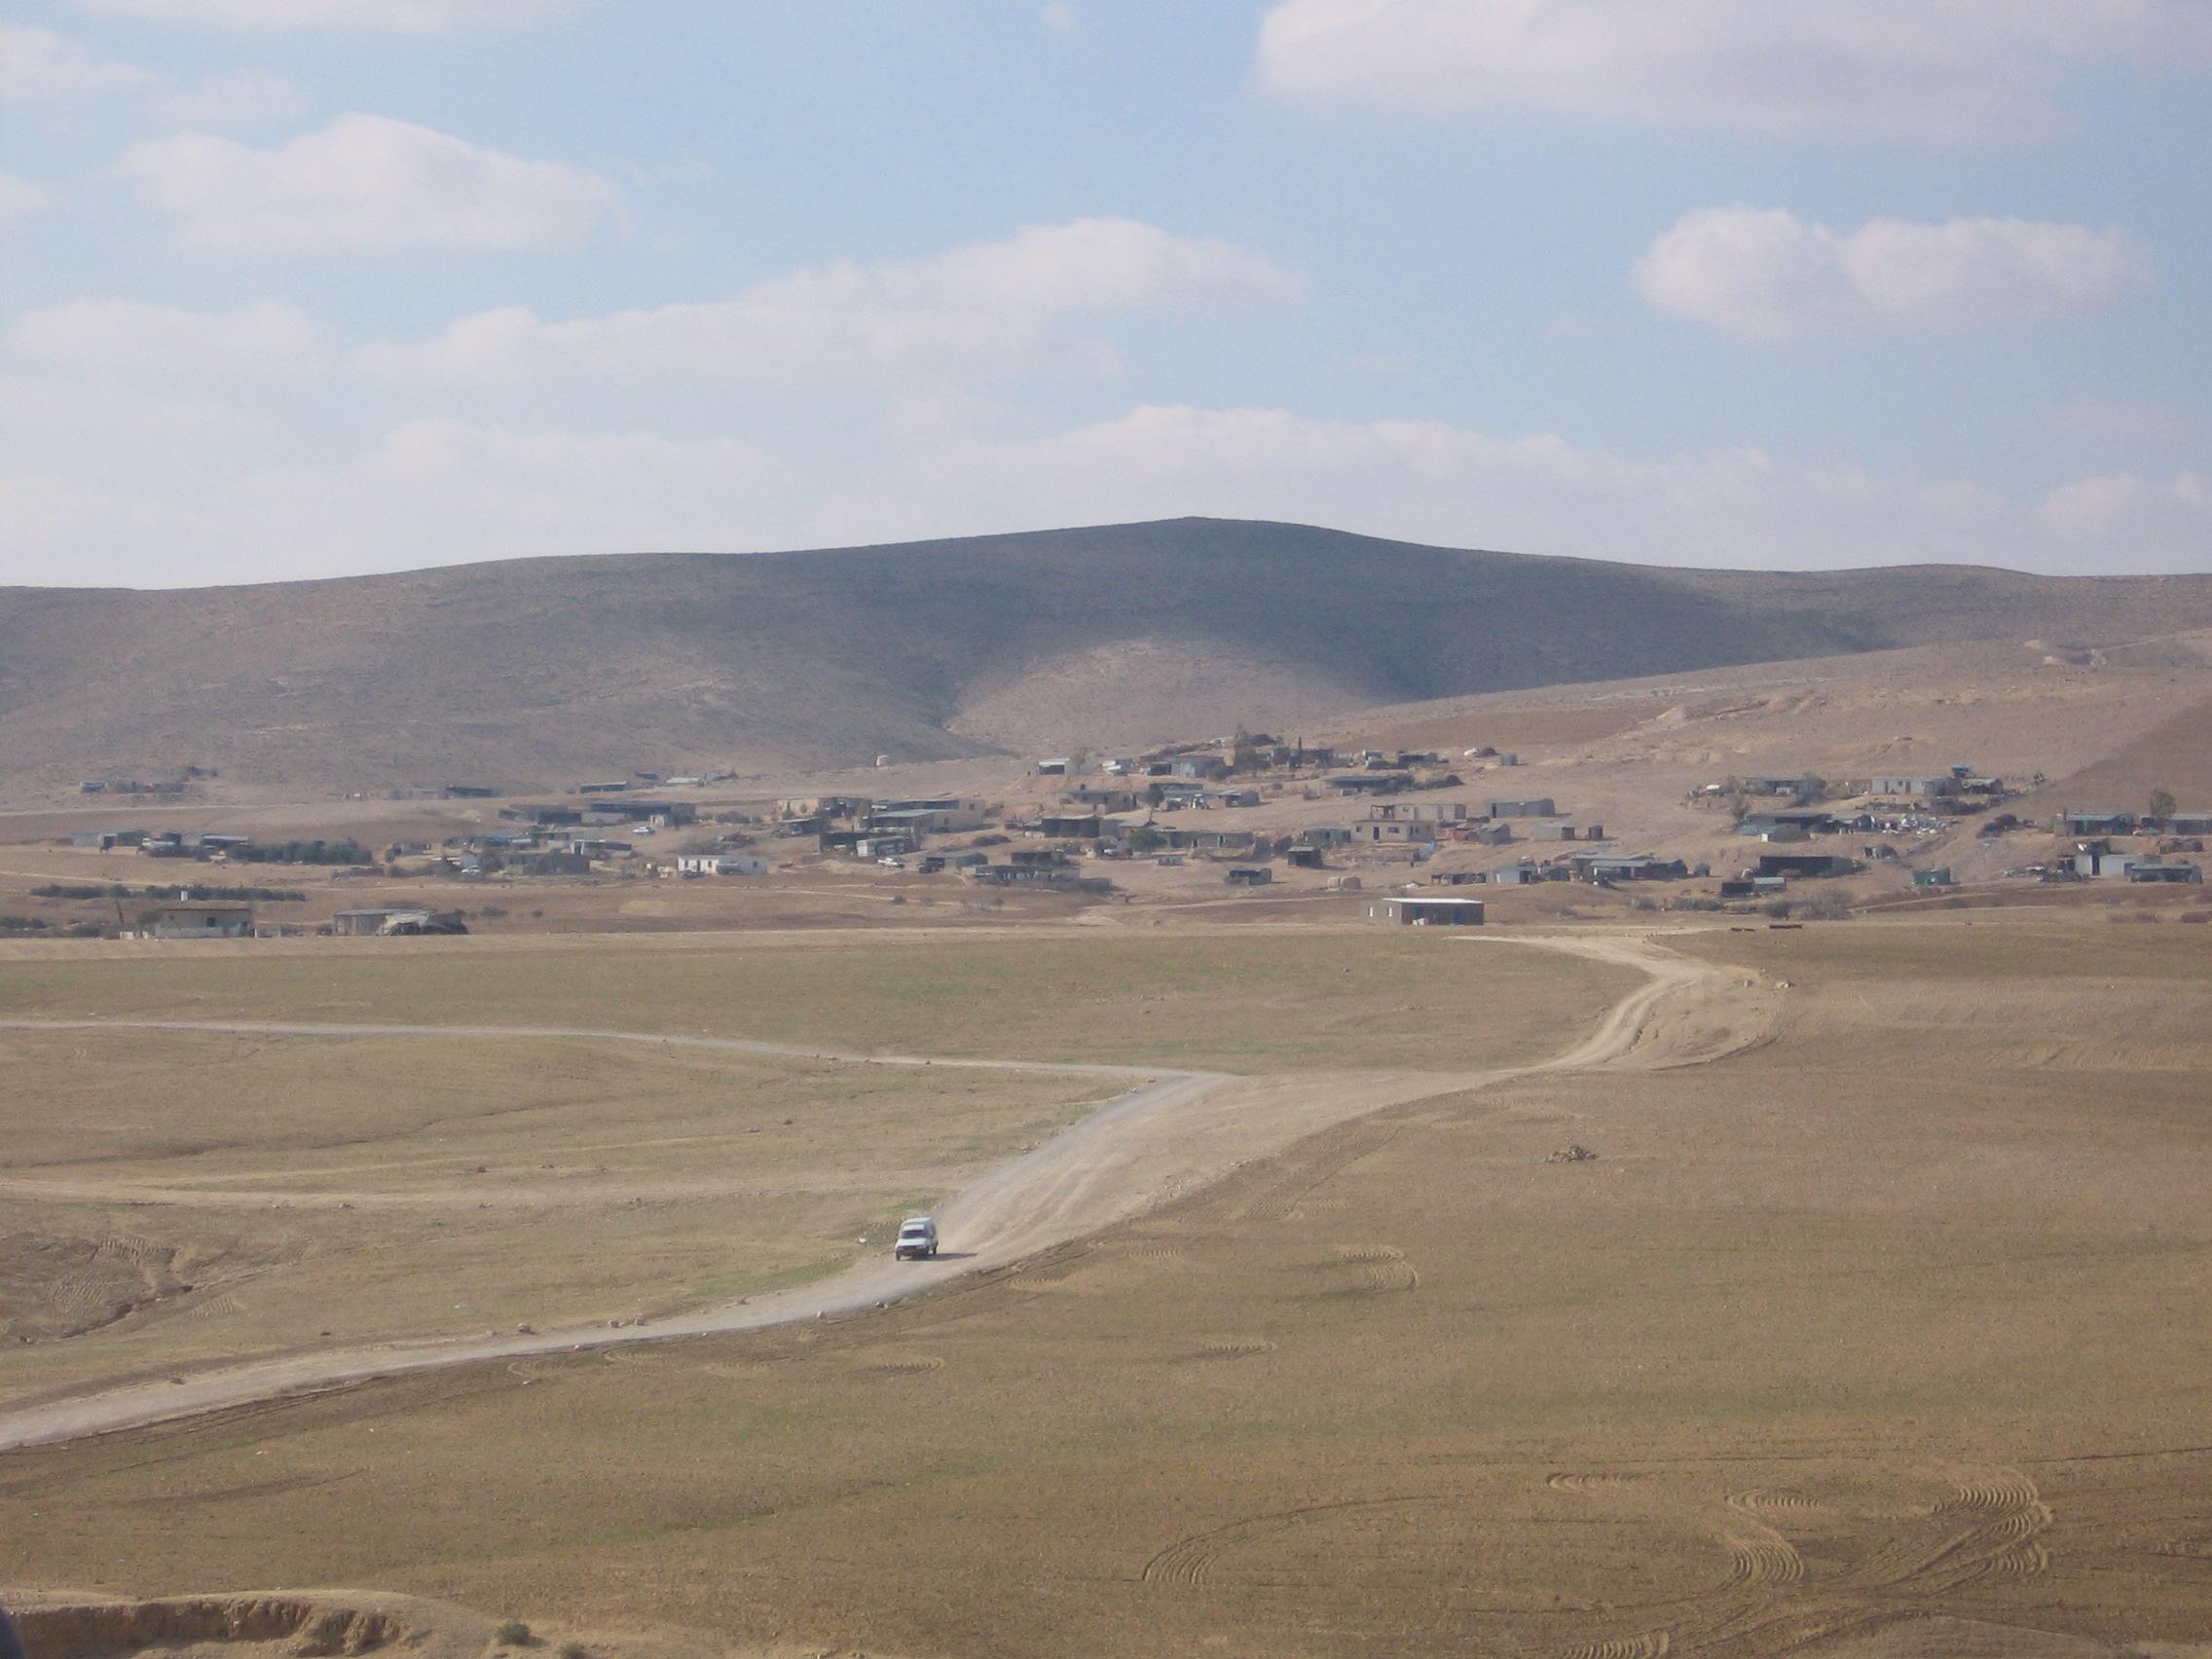 Unrecognized Bedouin Village in the Negev [ Source: Wikimedia ]